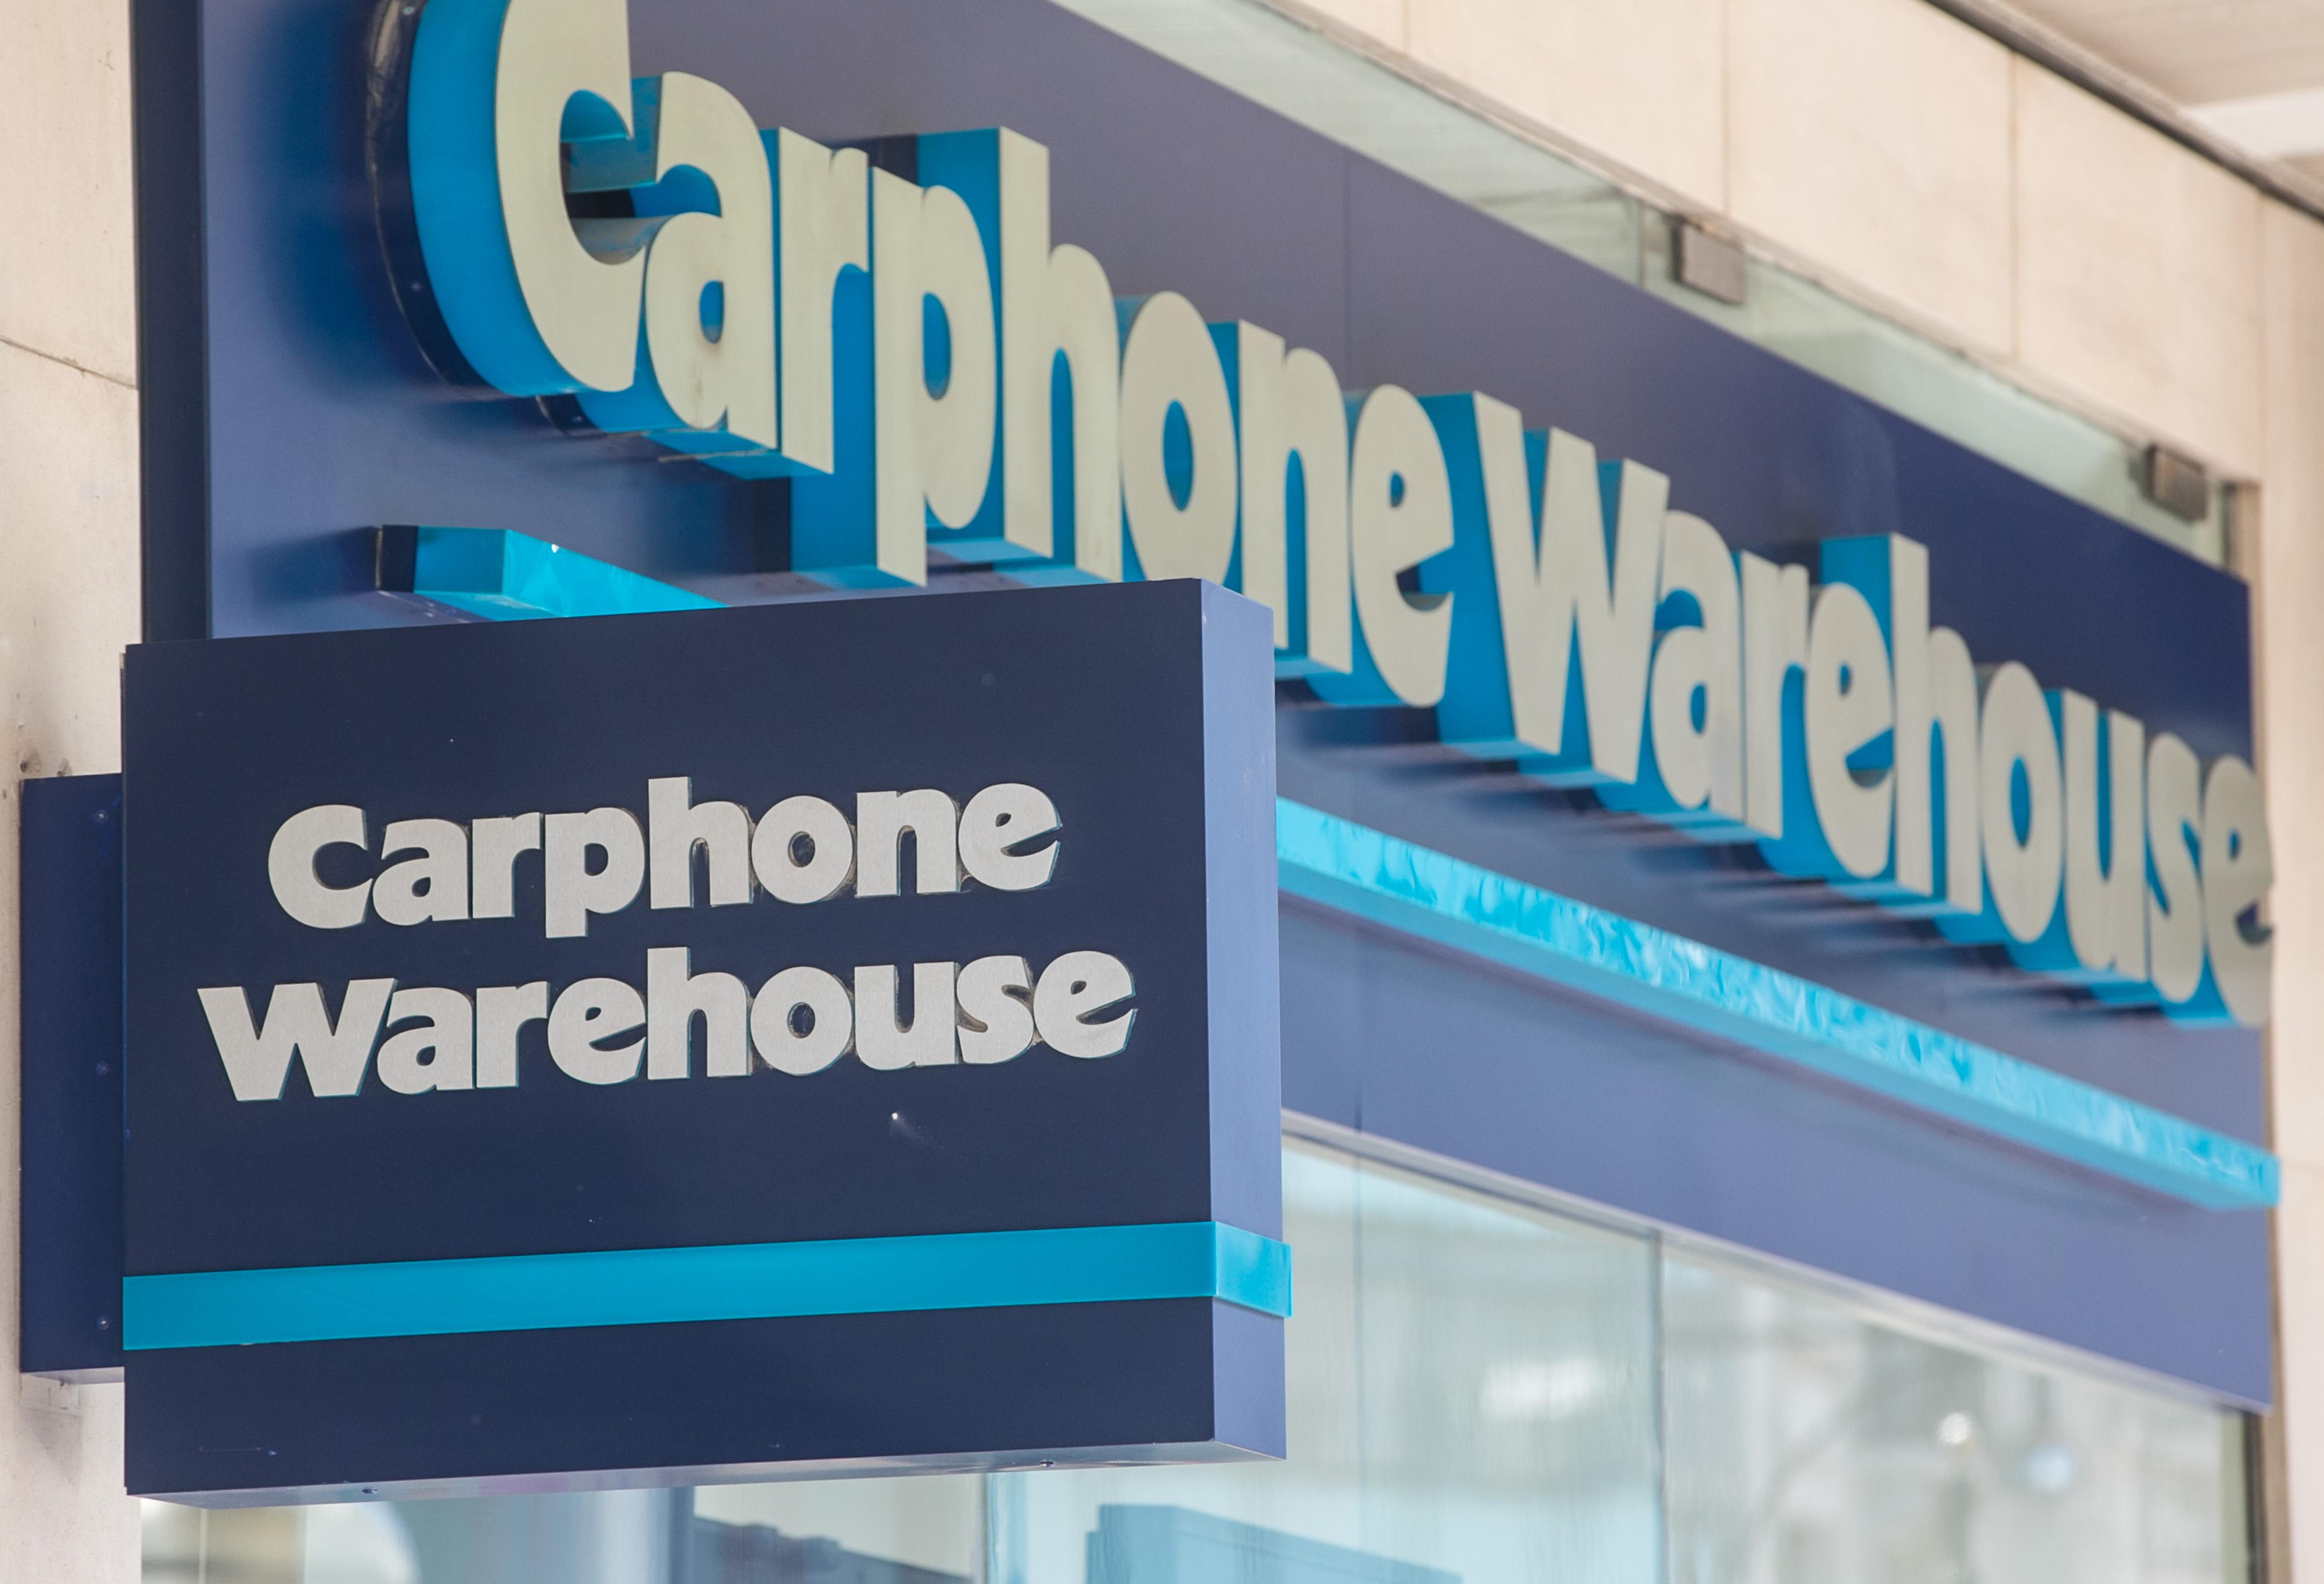 carphone warehouse - photo #4